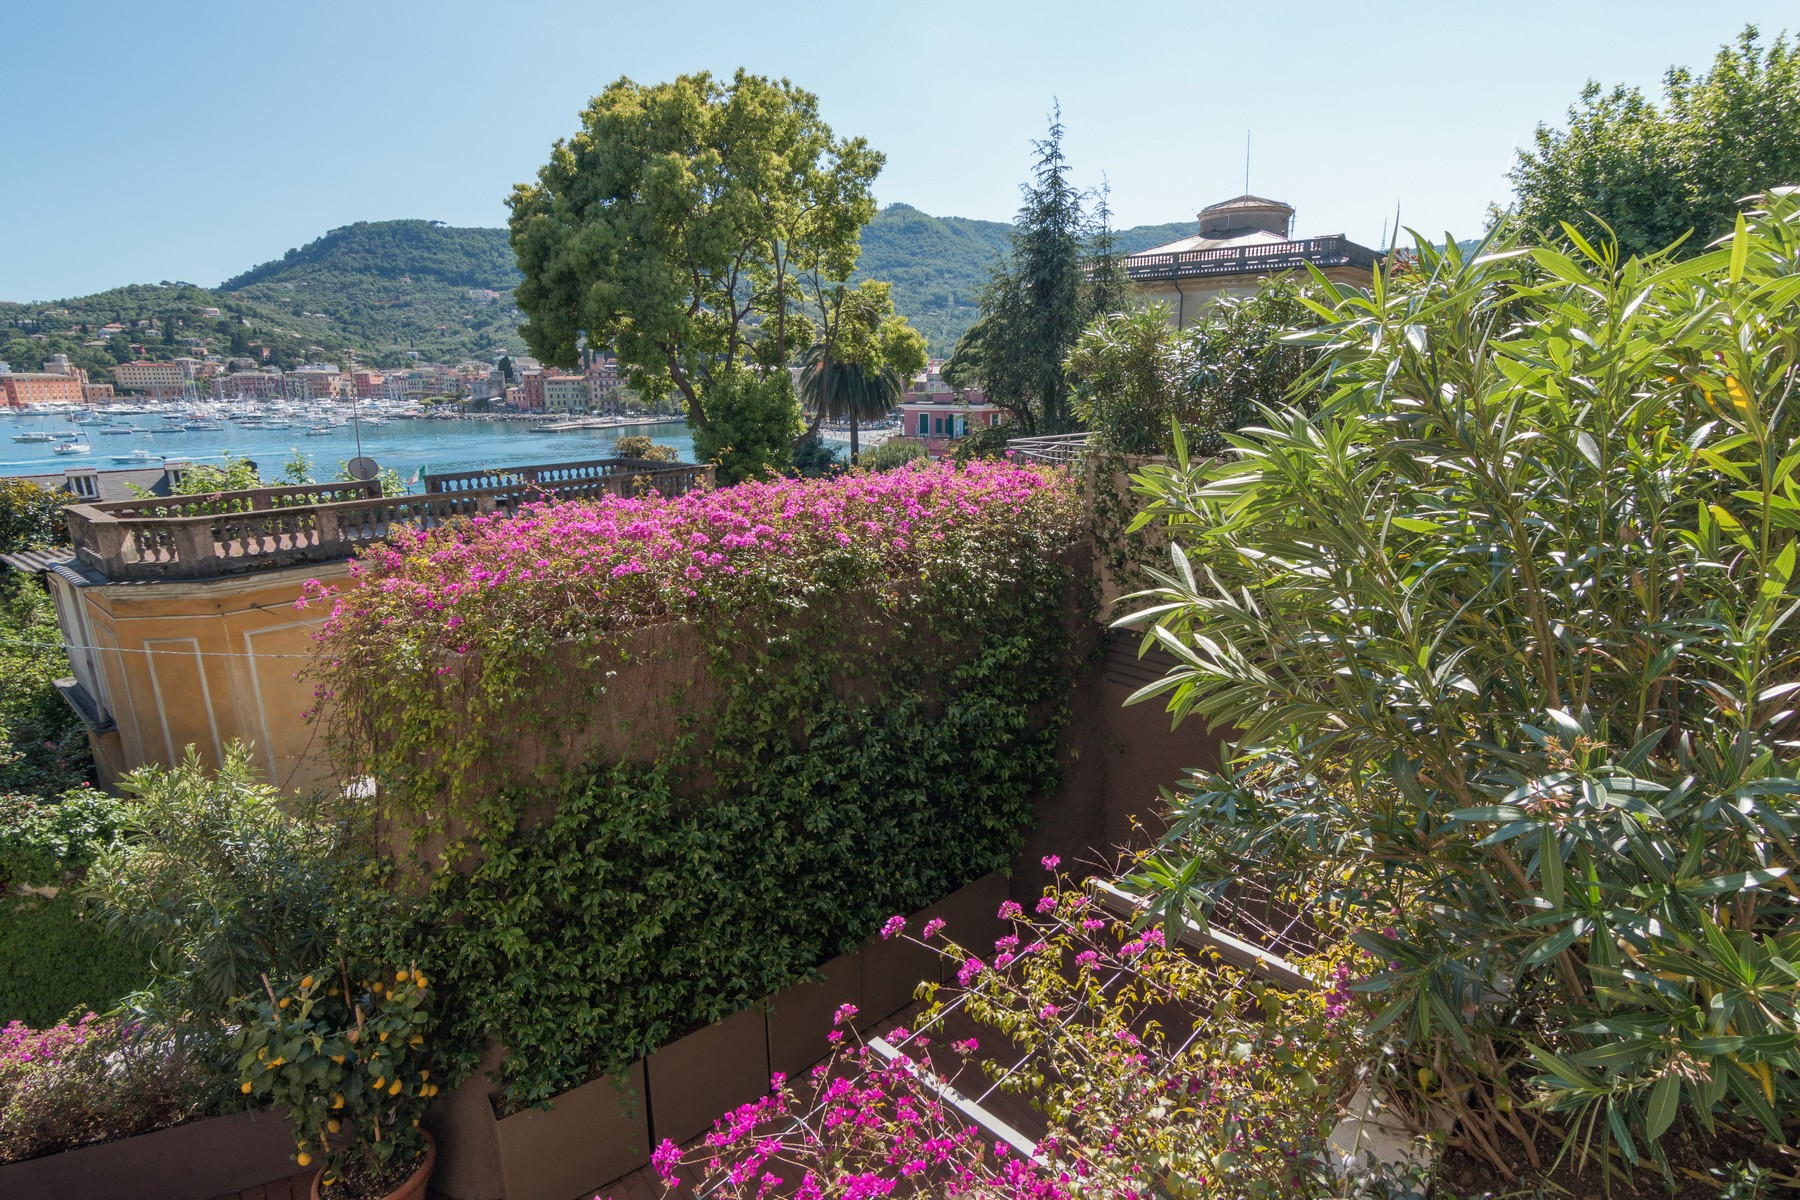 Attico in Vendita a Santa Margherita Ligure via roma